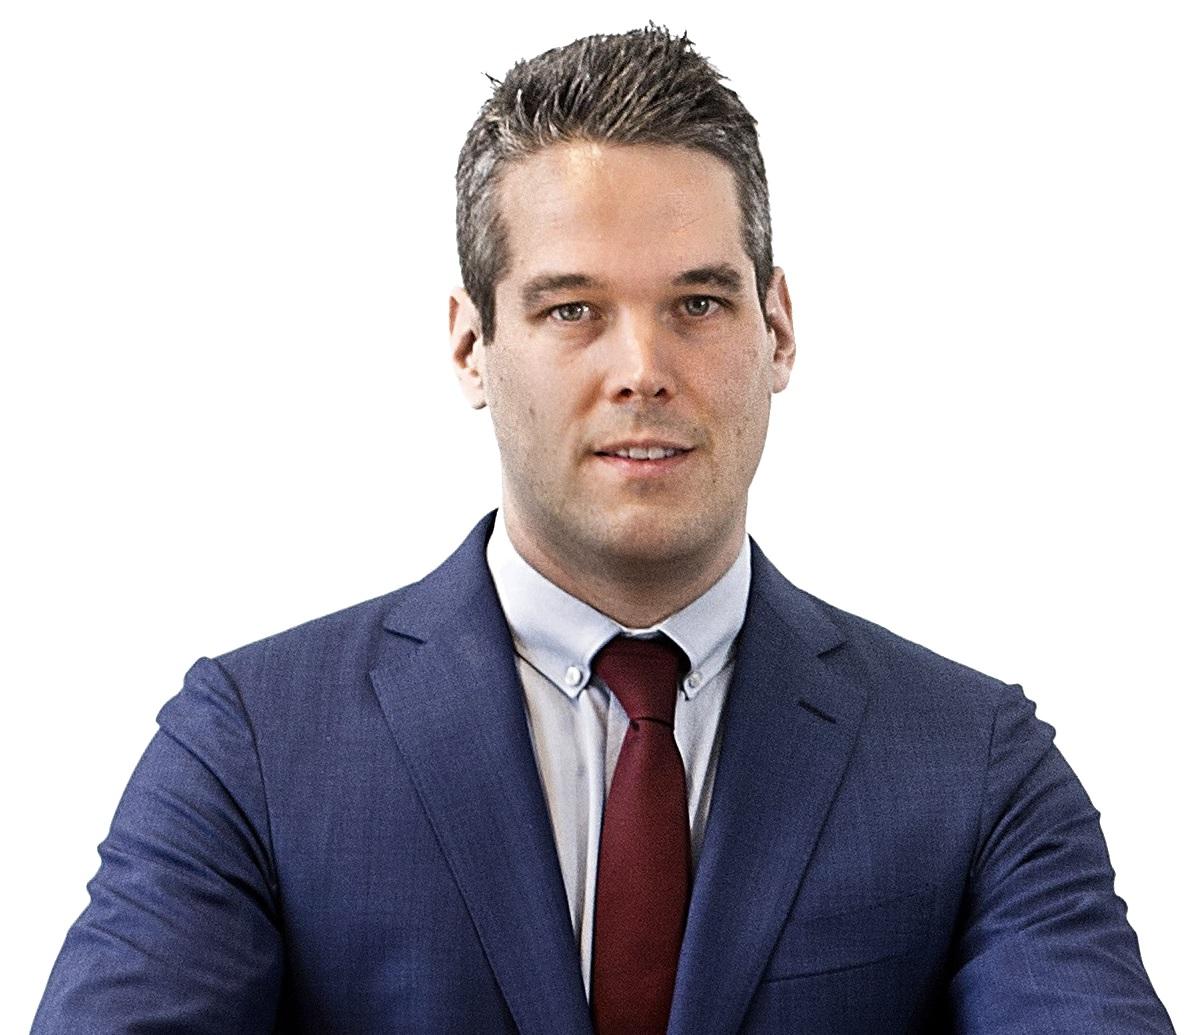 Pieter Huyberechts